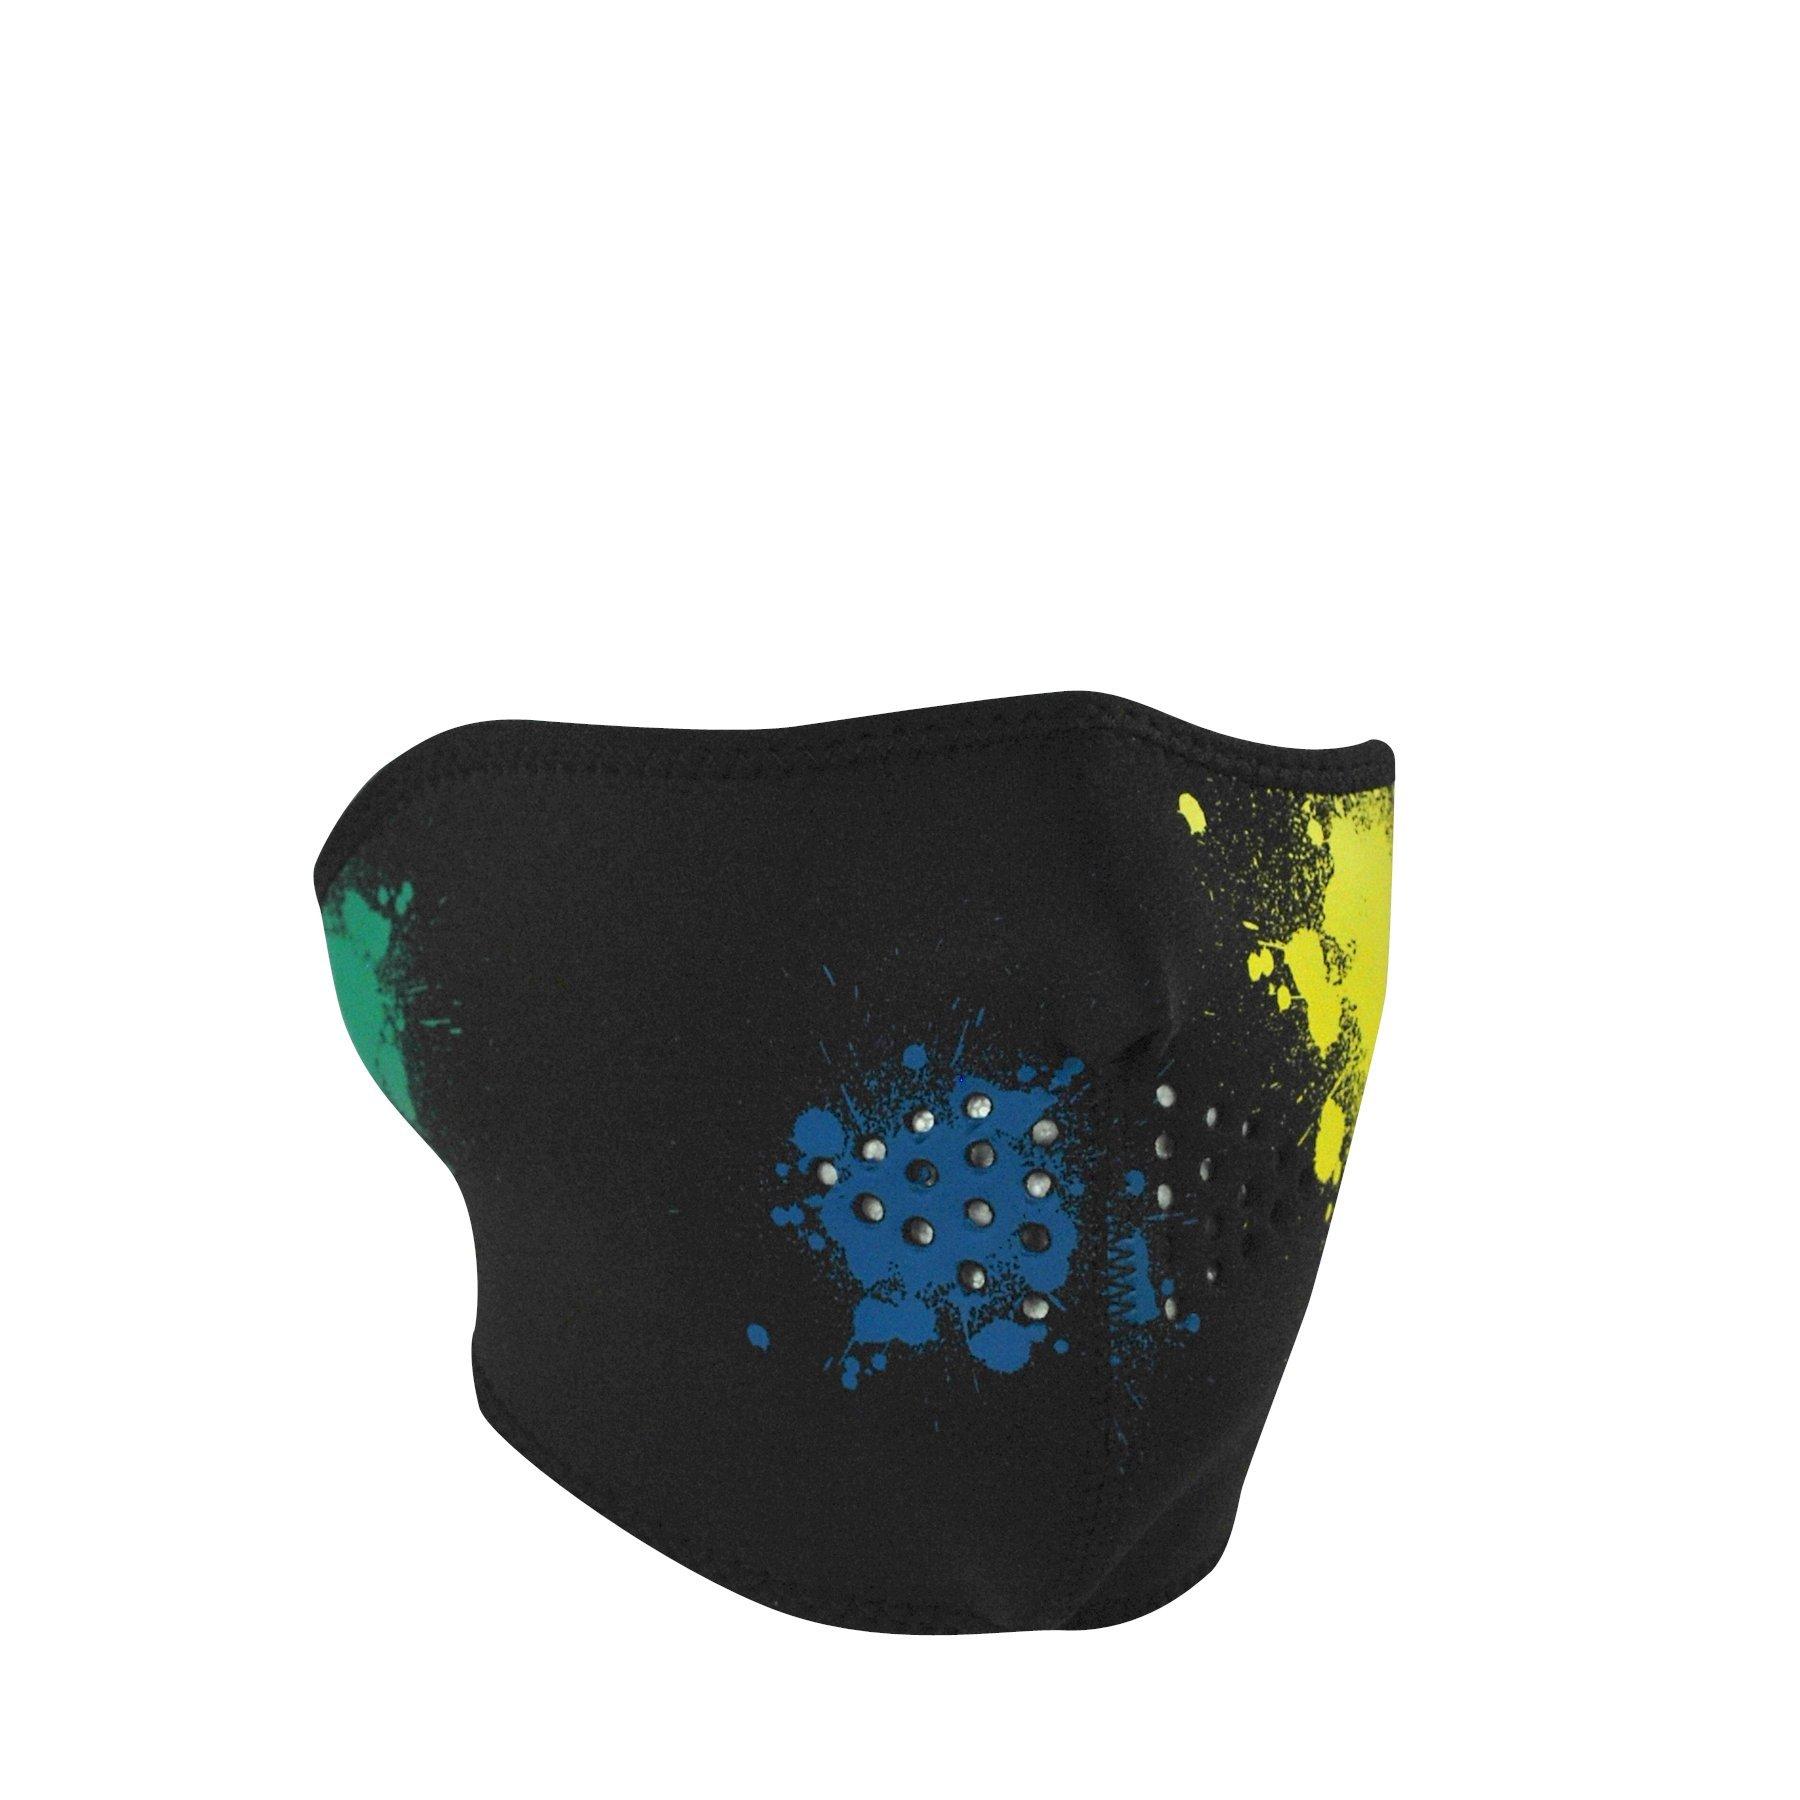 Zanheadgear Neoprene Half Face Mask, Splatter, Glow in the Dark